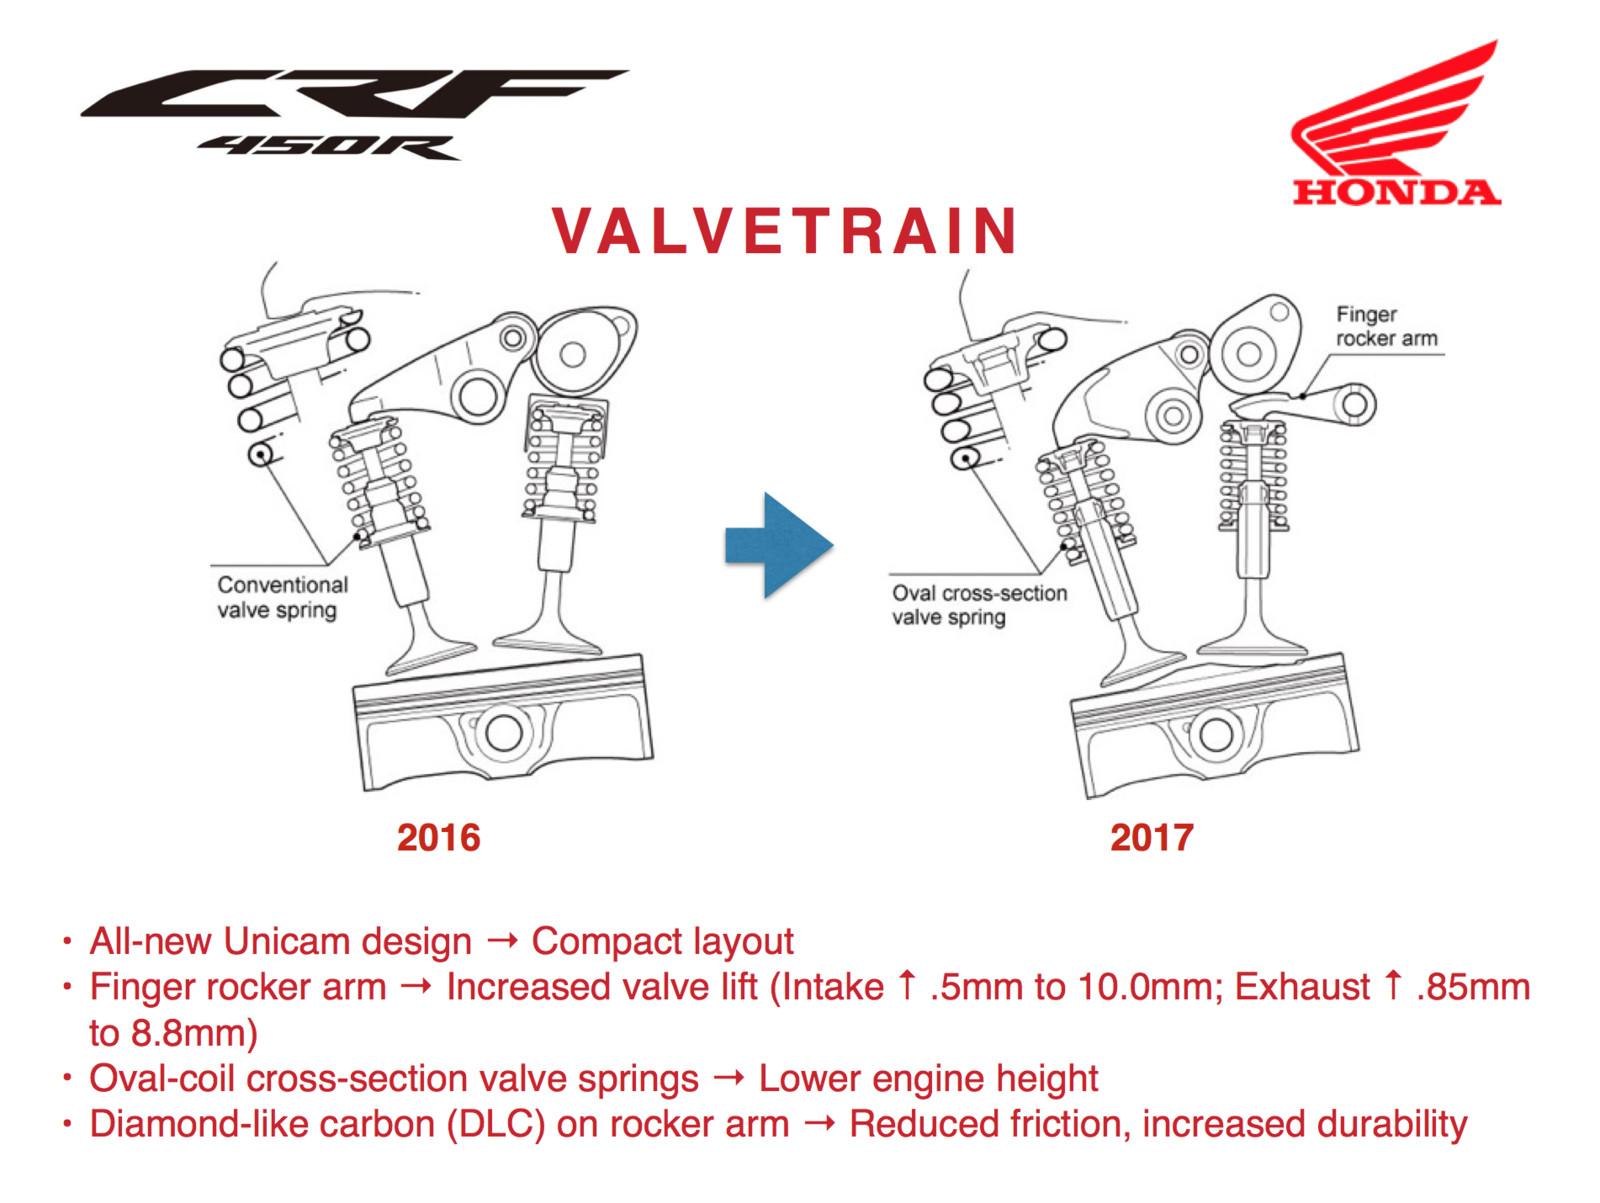 Honda Engine Lifter Diagram Automotive Wiring Train Diesel Unicam Valve Todays Rh 4 18 10 1813weddingbarn Com Lifters Inside Ducati